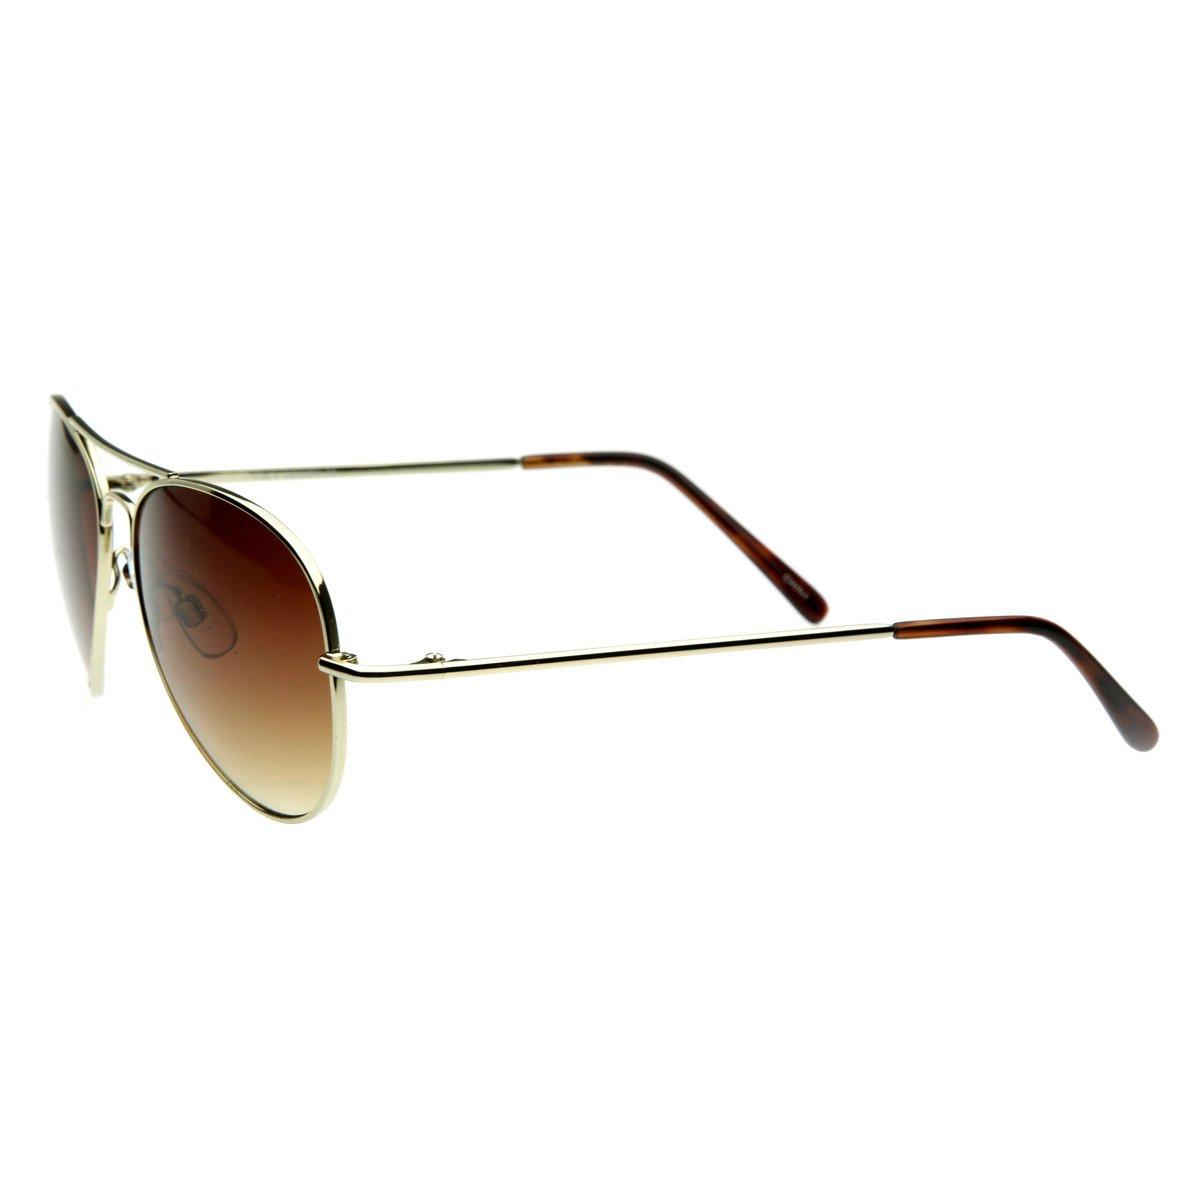 zeroUV - Small Frame Women Aviator Sunglasses for Small Faces 50 mm ...